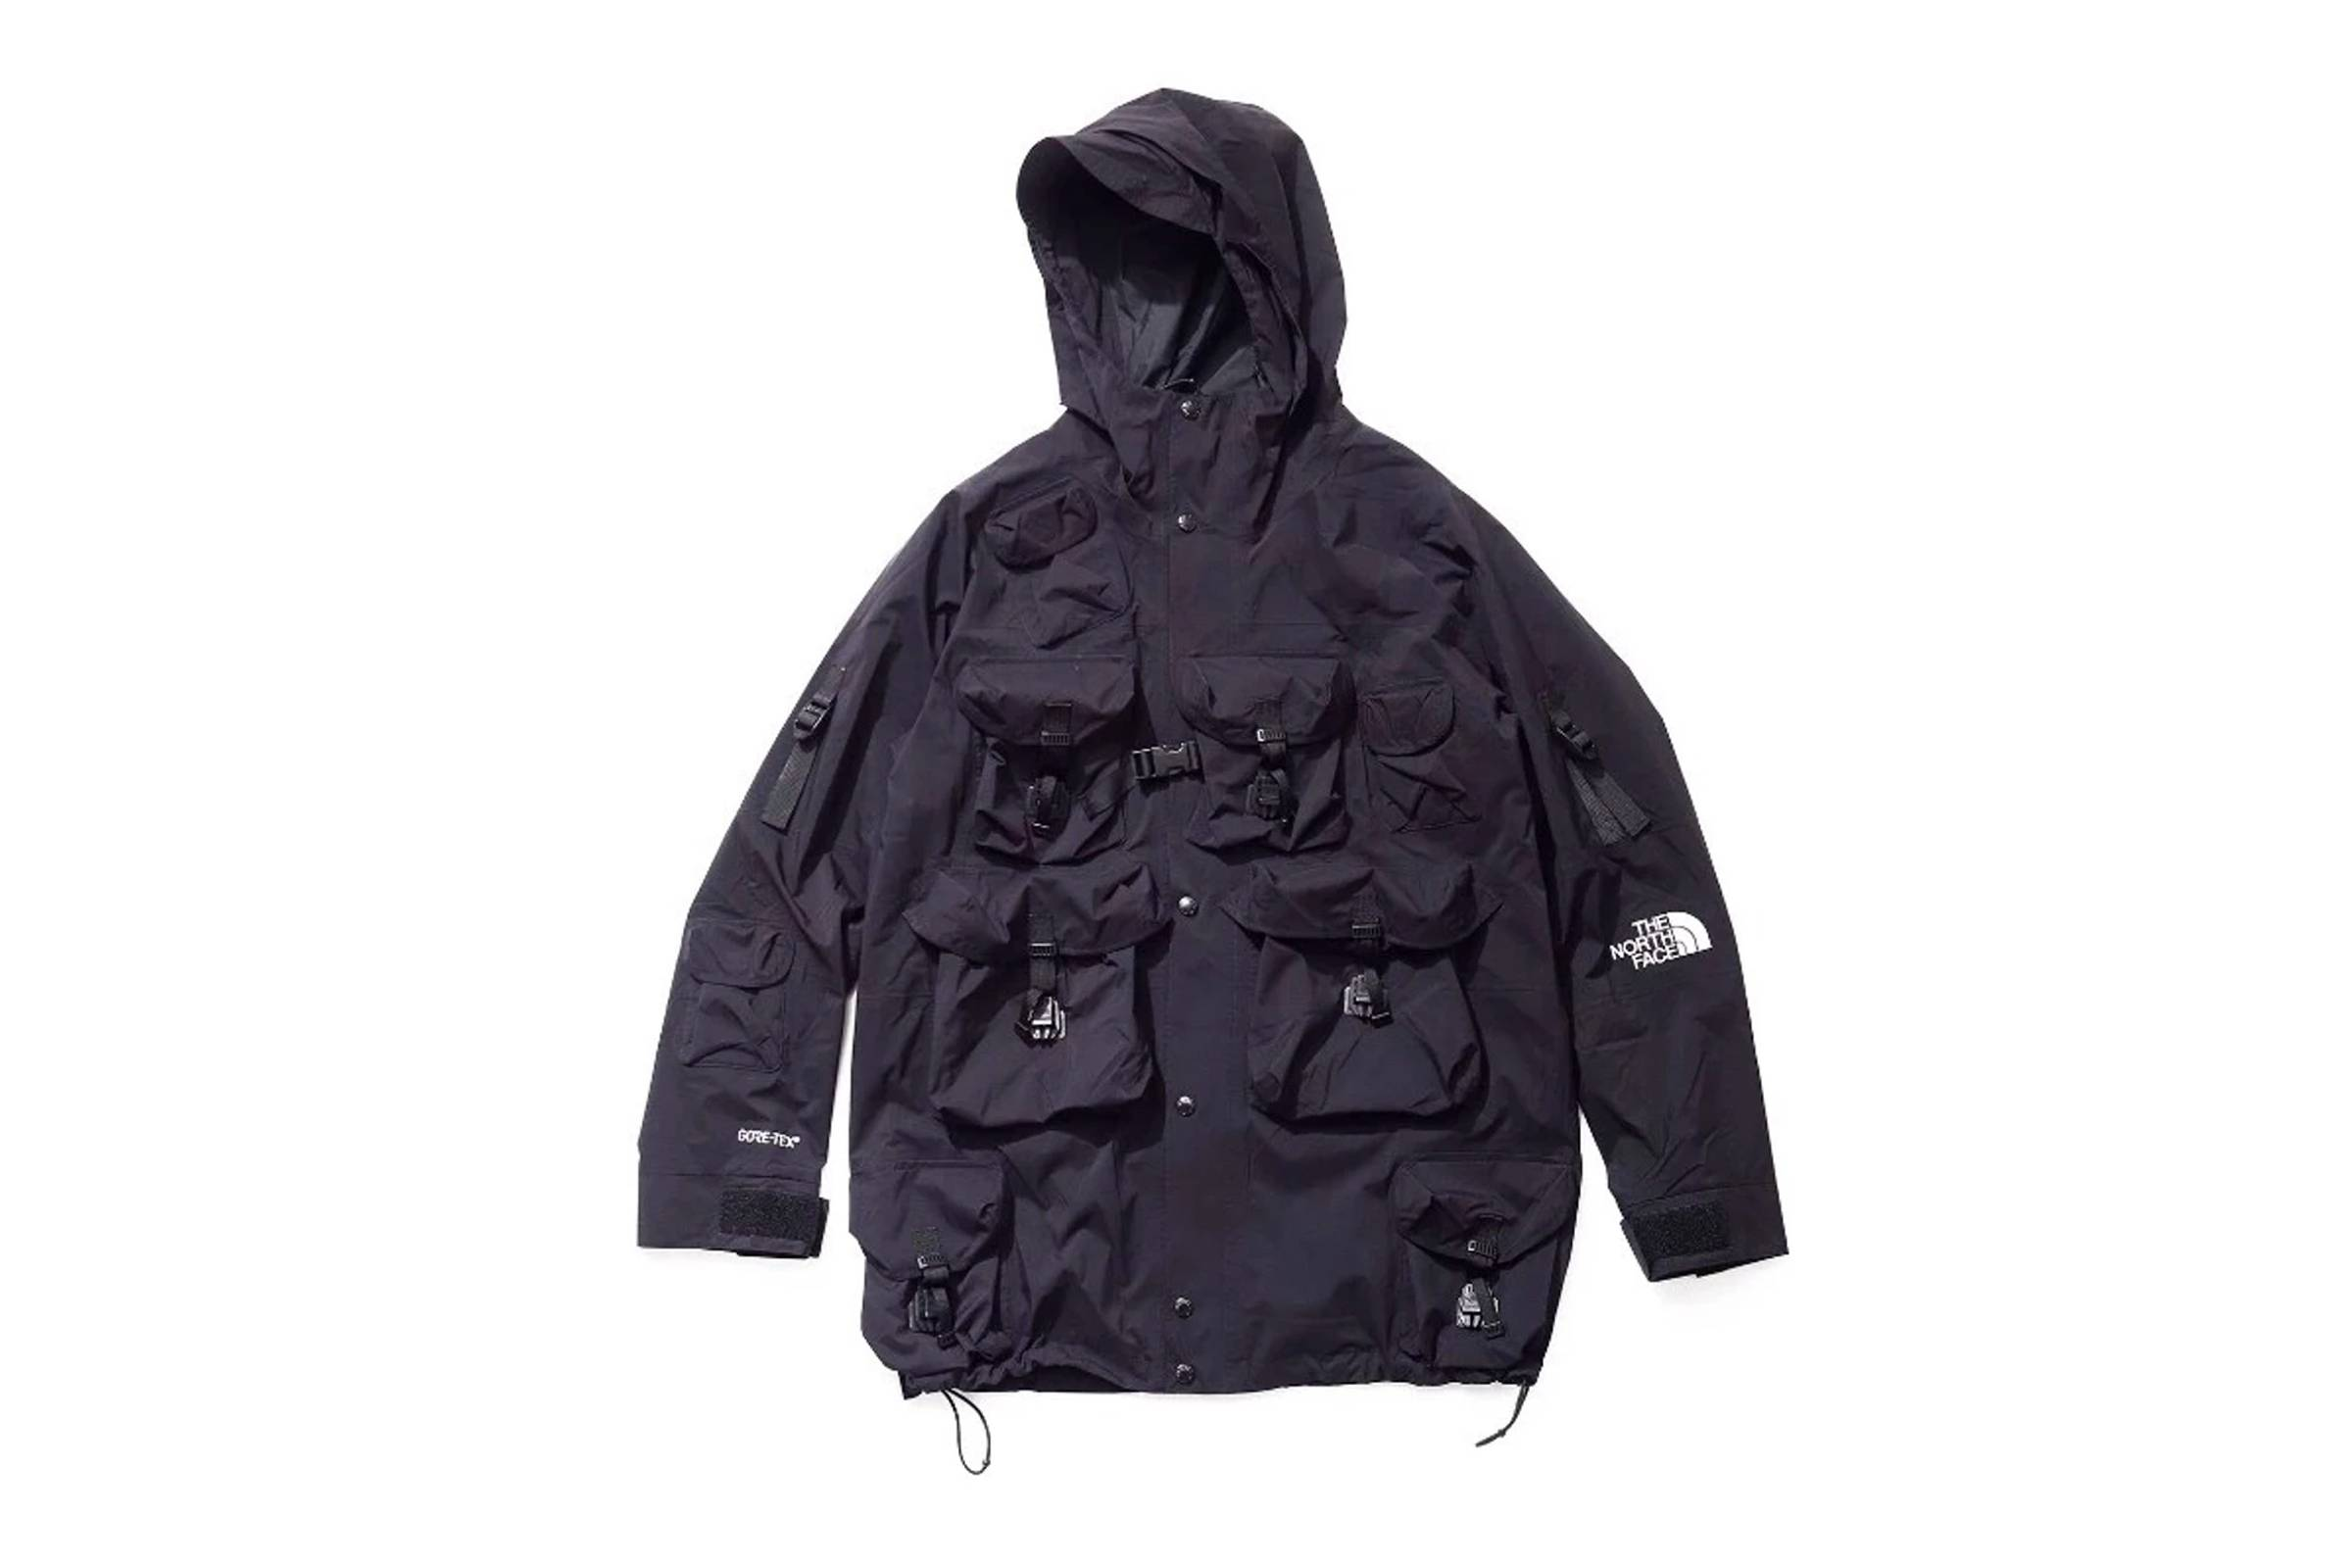 The North Face x Kazuki Kuraishi Urban Exploration Gore-Tex Jacket